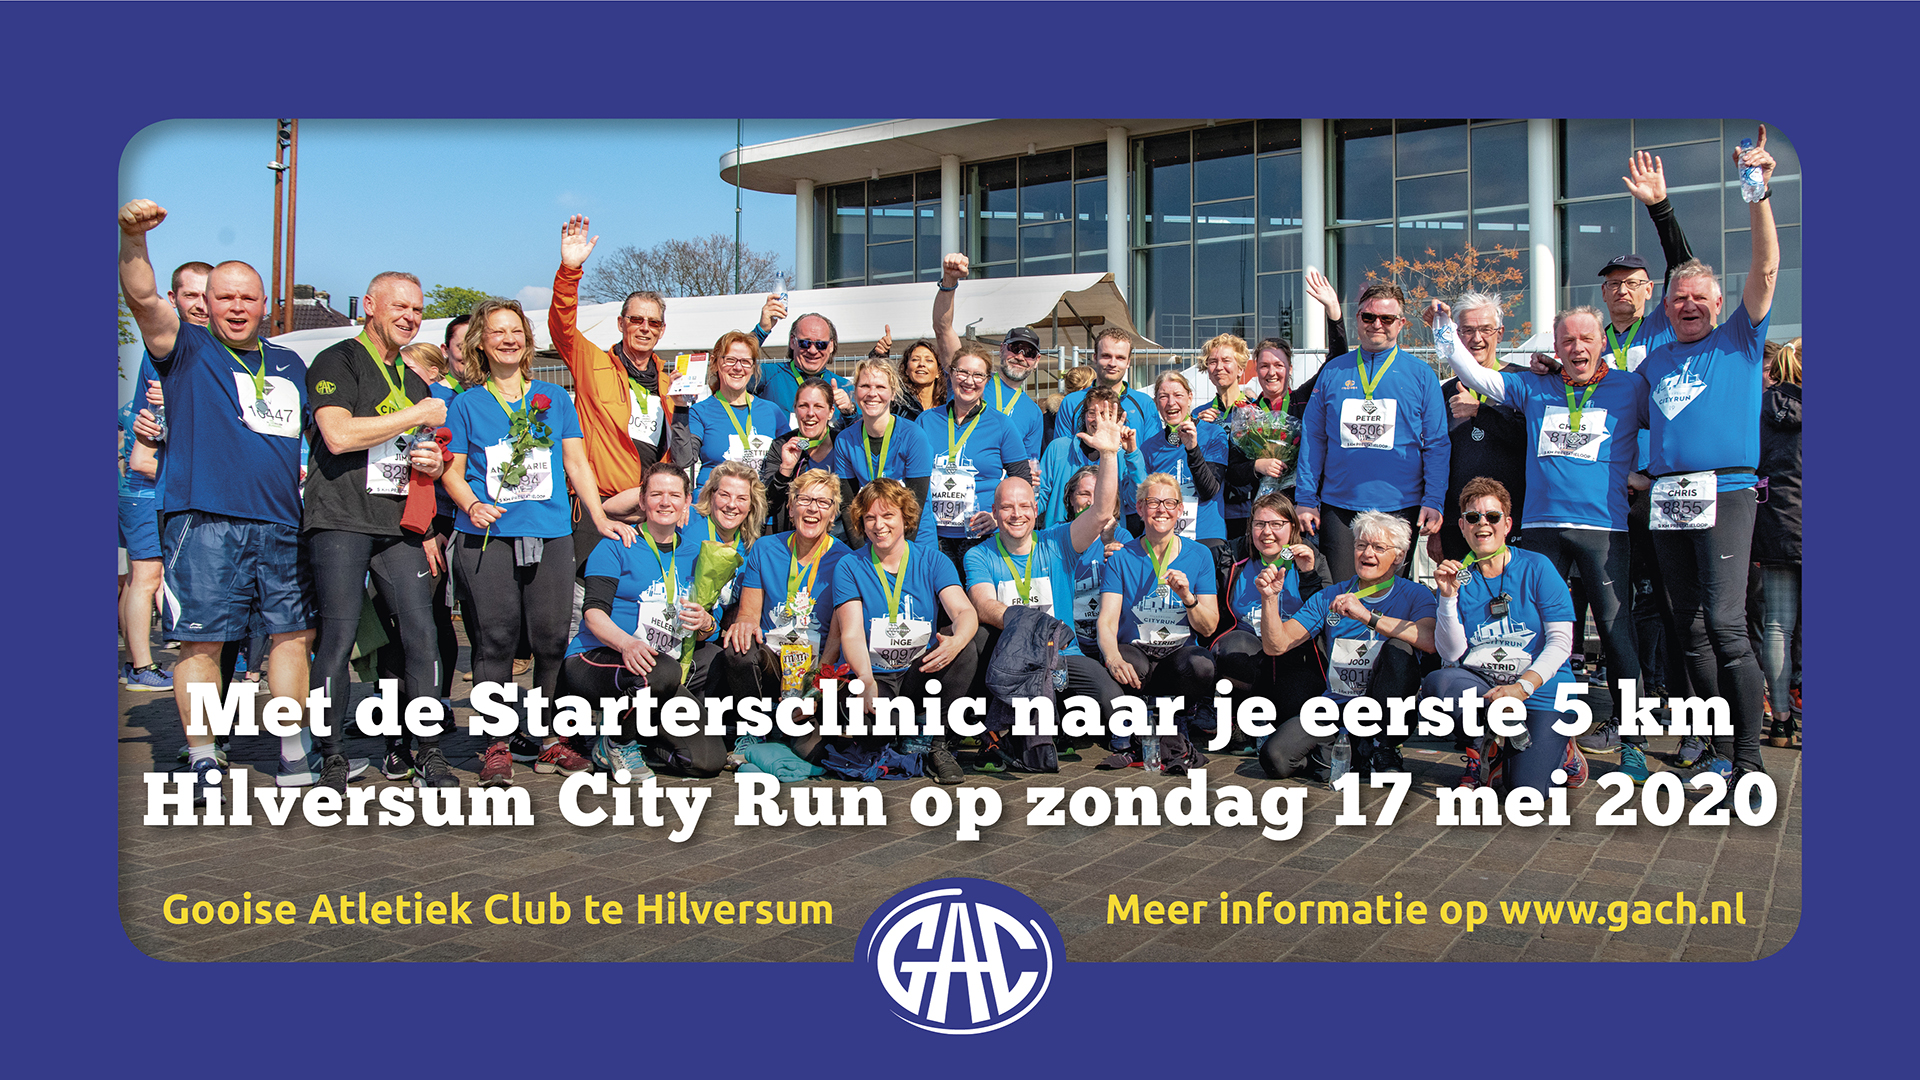 Startersclinic Gaat Van Start